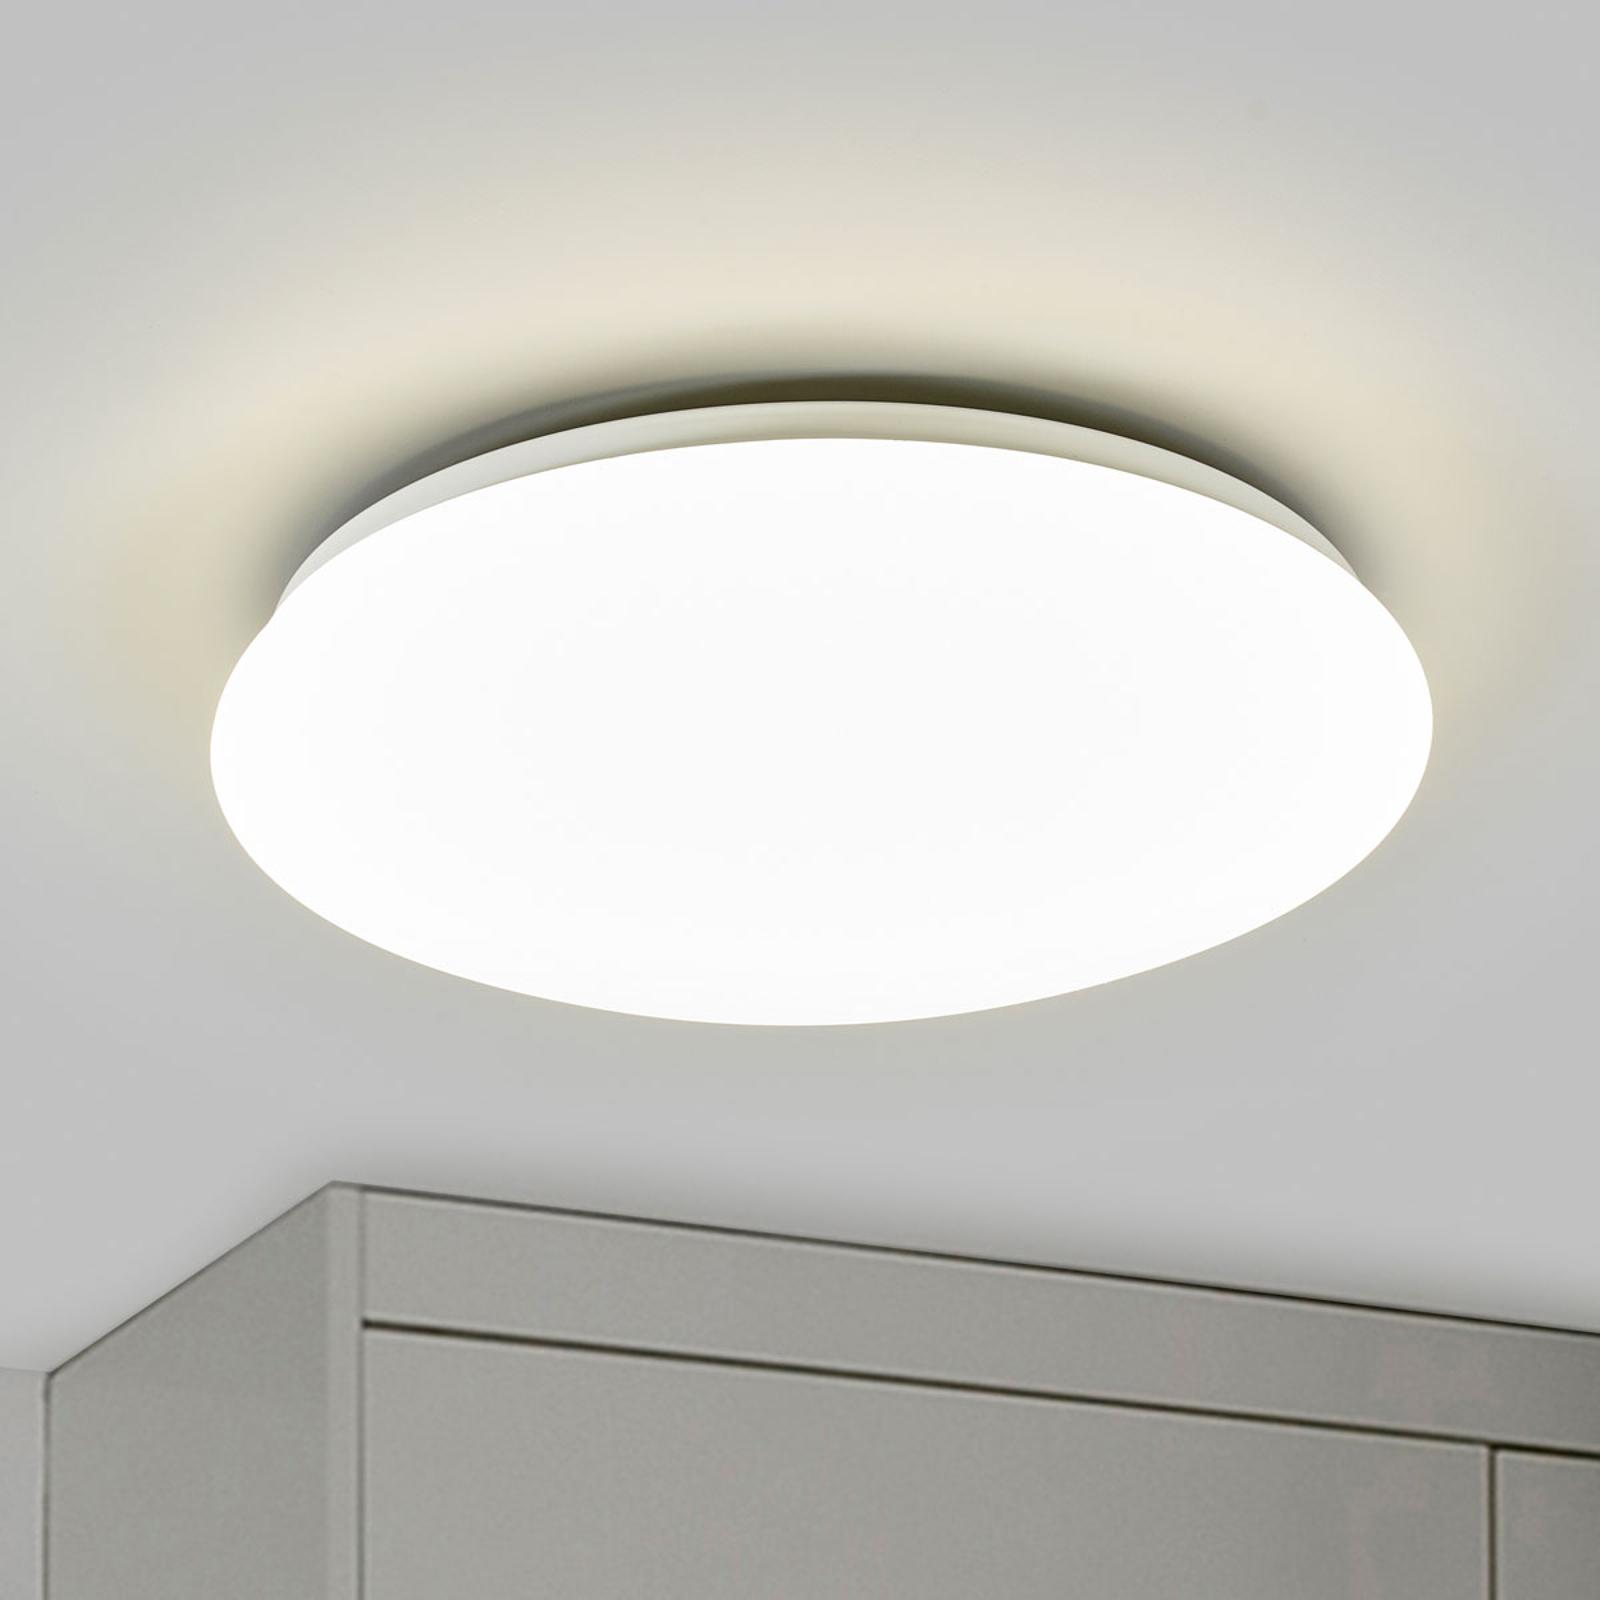 Biała lampa sufitowa LED SUEDE